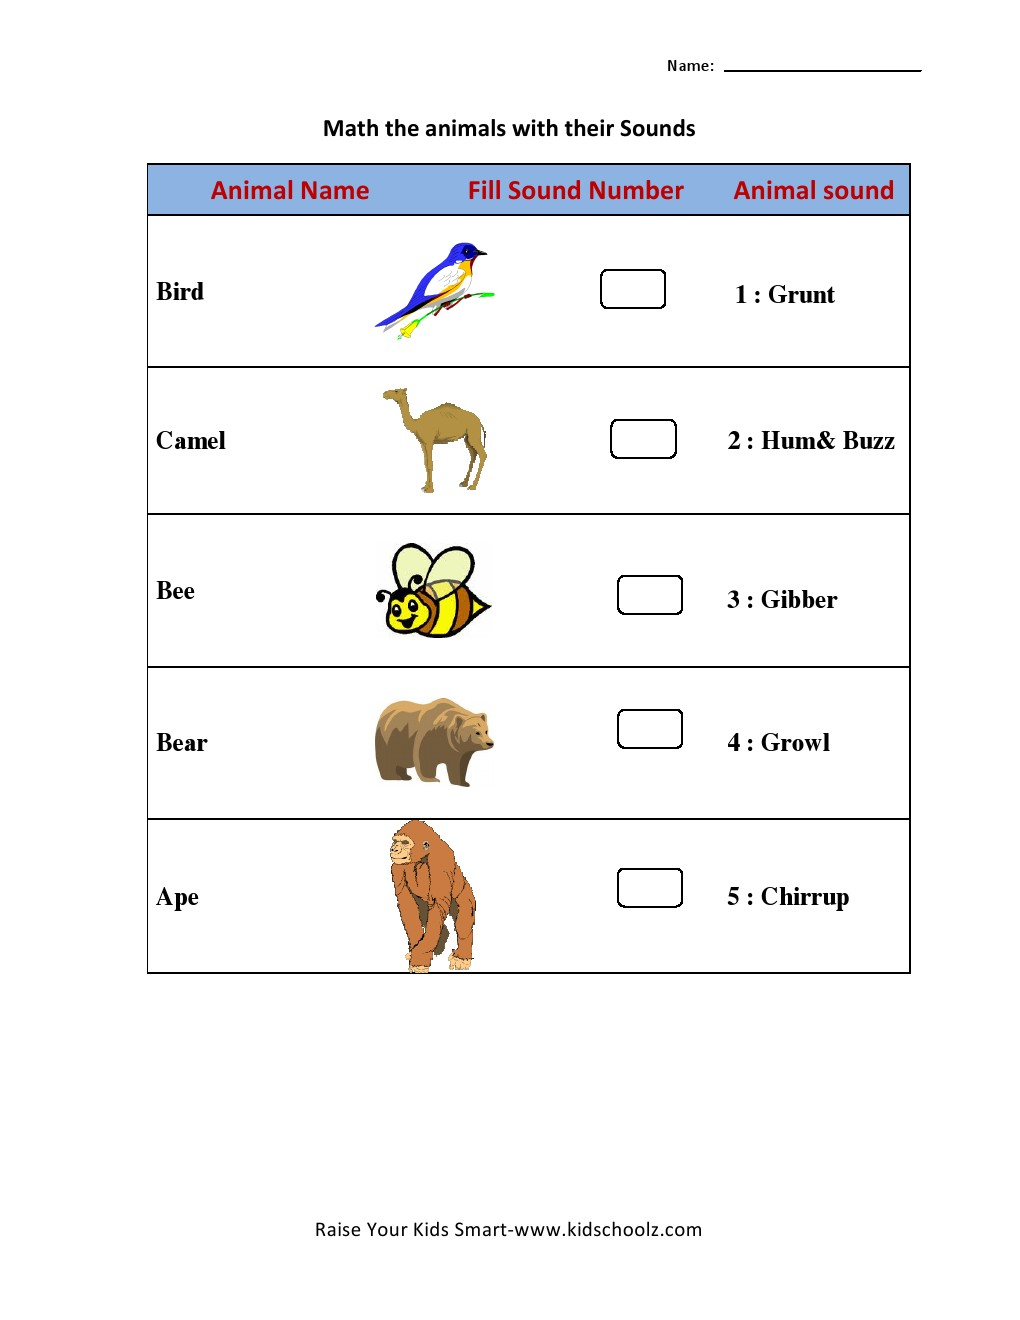 Workbooks lkg writing worksheets : Animal Sound Matching Worksheets - Kidschoolz